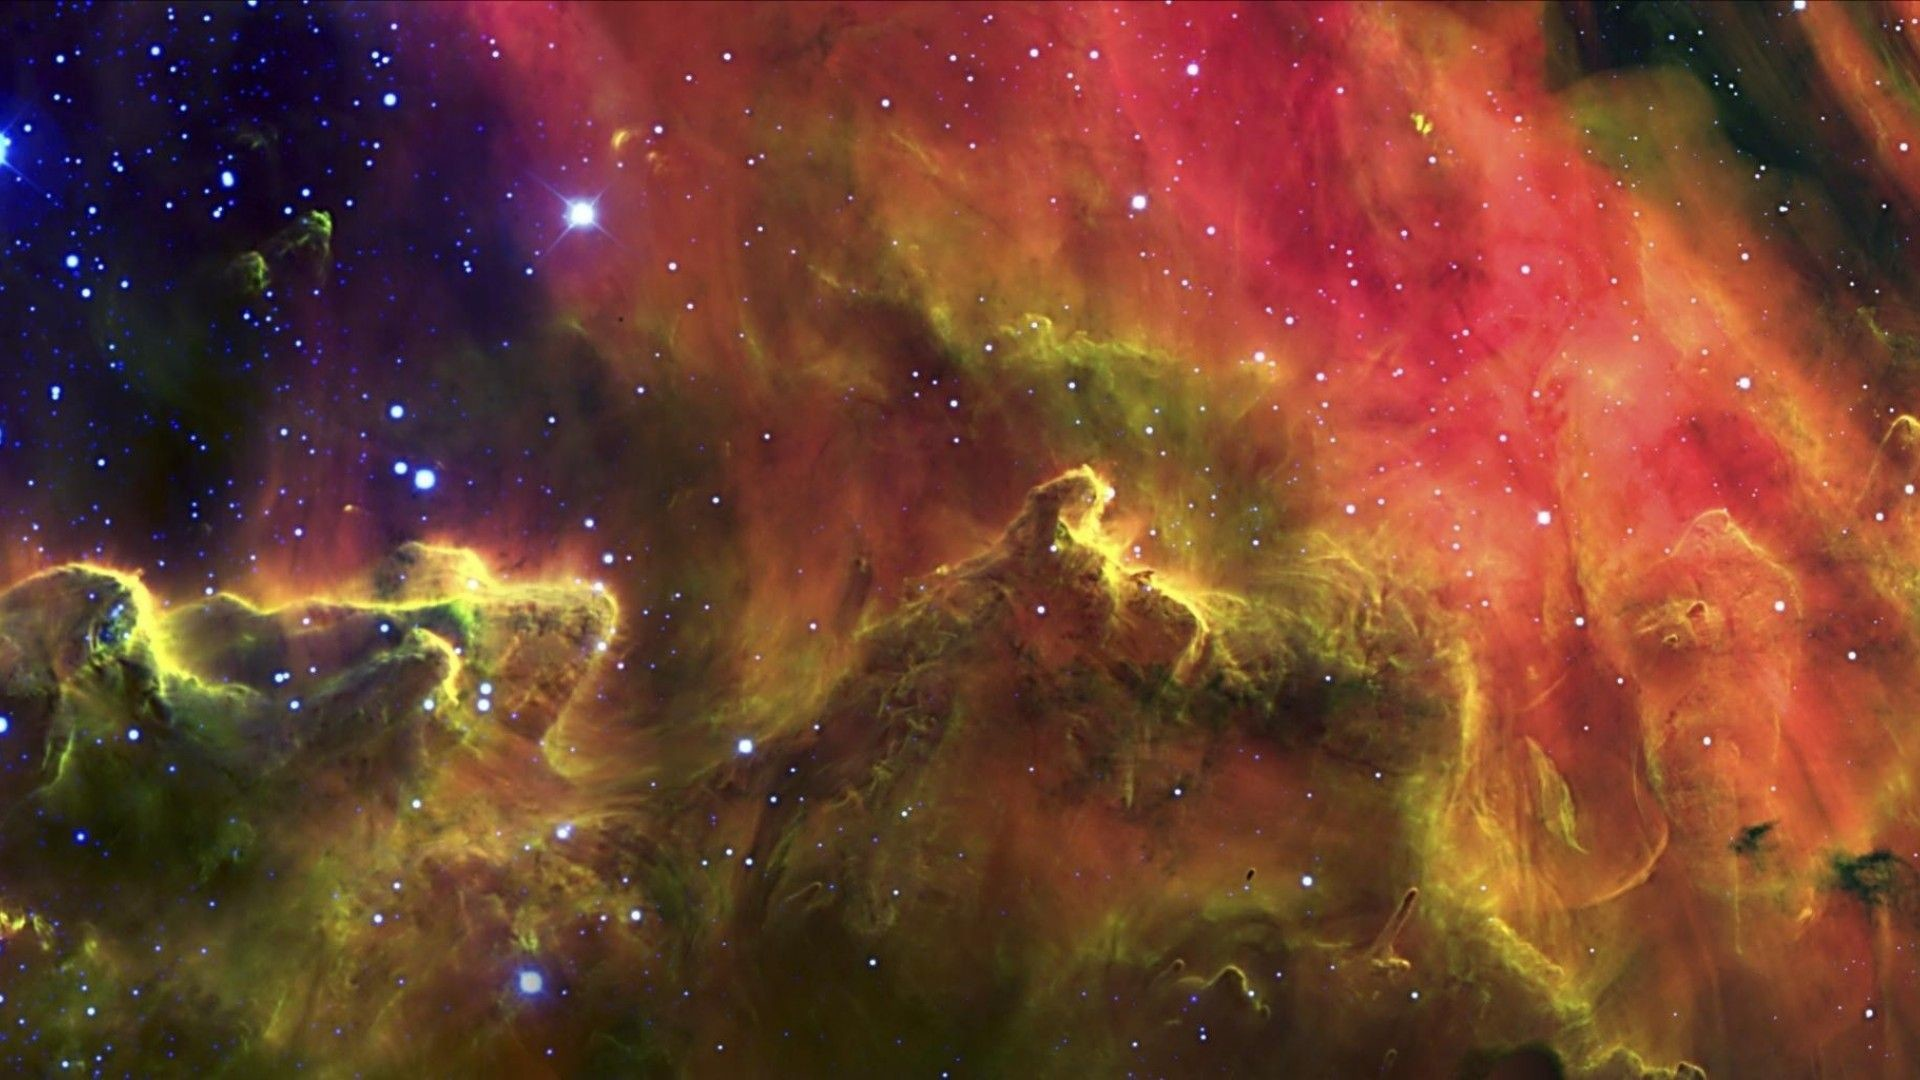 Space Wallpaper Hubble Hd Cool 7 HD Wallpapers .